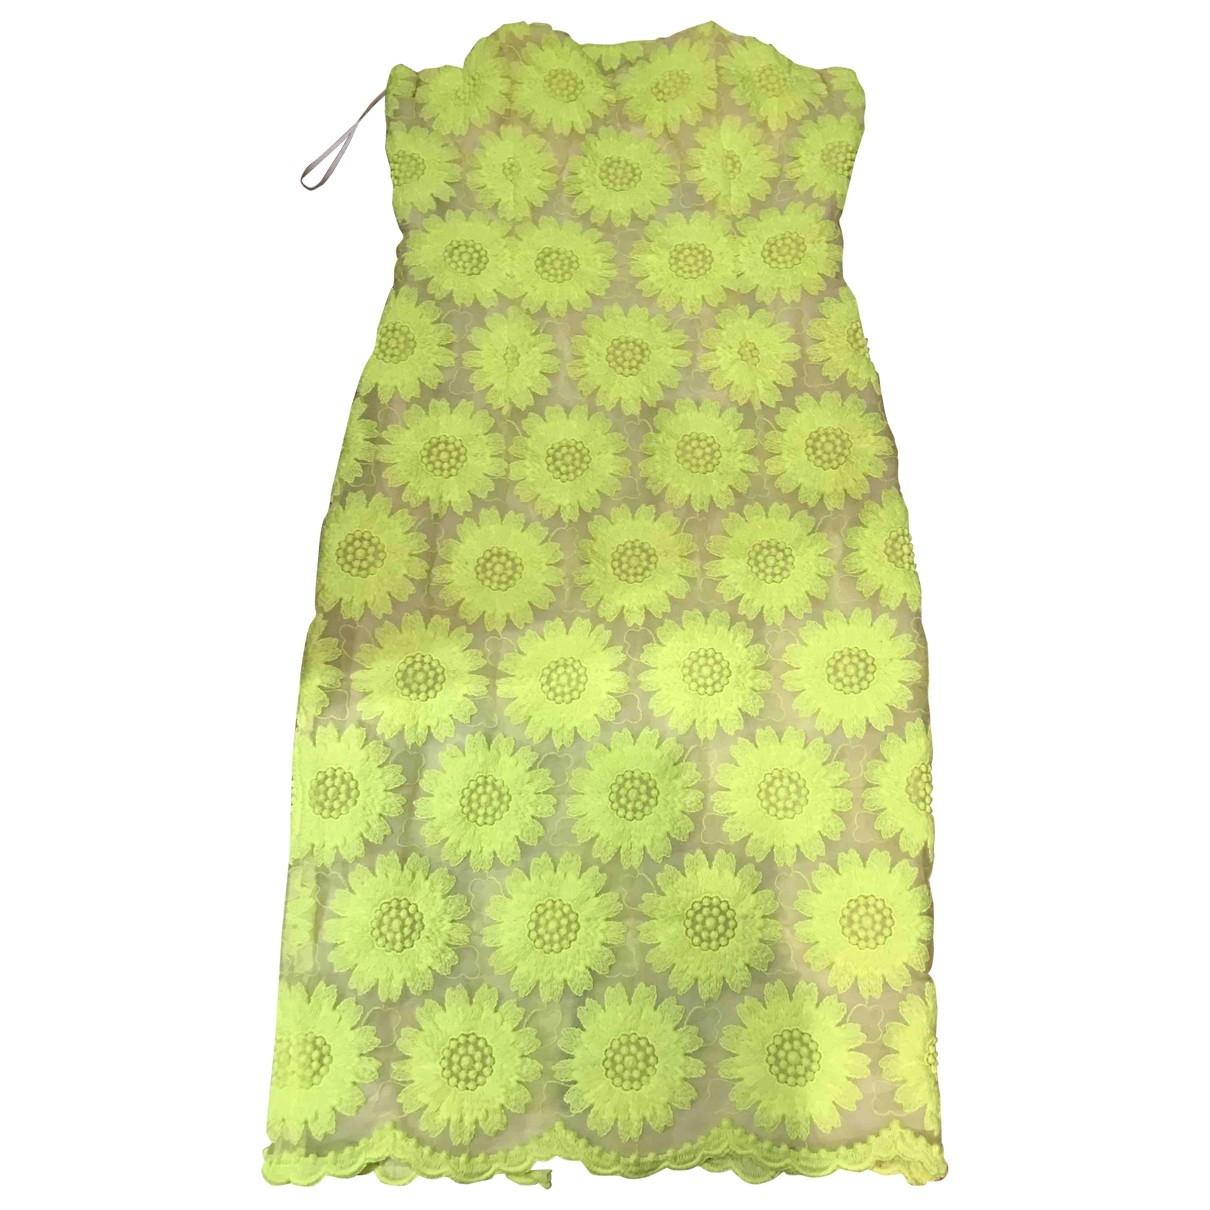 Giambattista Valli \N Yellow dress for Women 42 IT